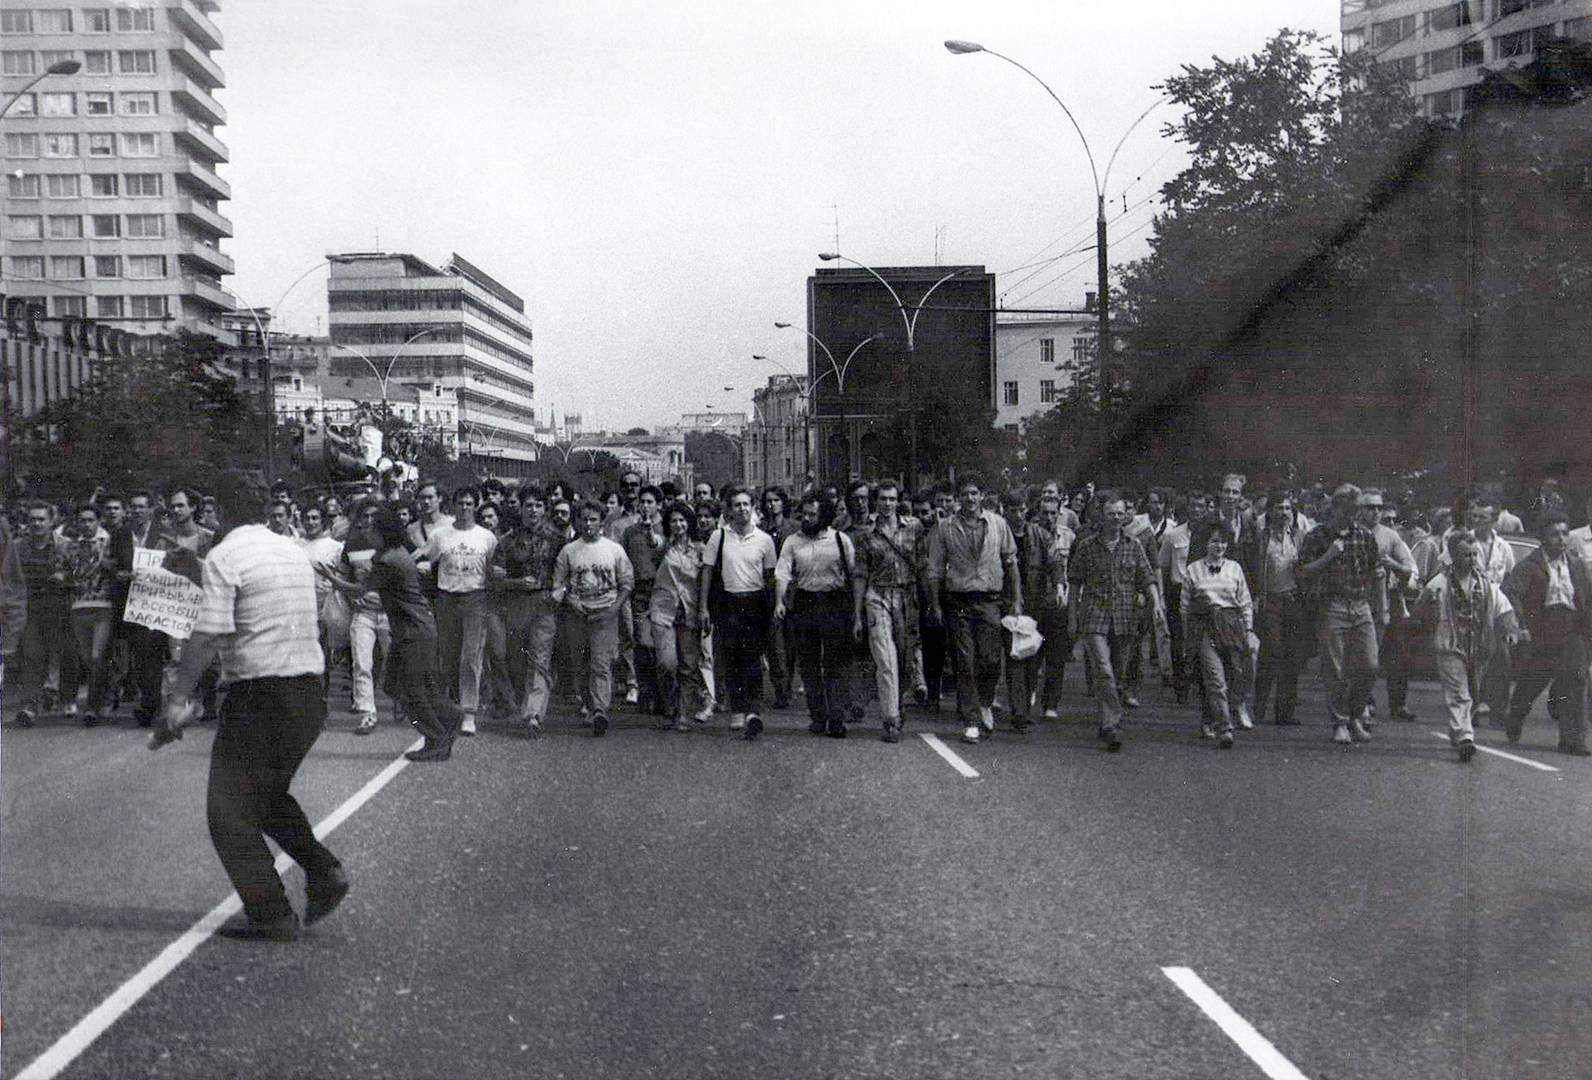 Москва, проспект Калинина. Марш от Кремля к Дому Советов. 19 августа 1991 года (Фото — Иван Симочкин)